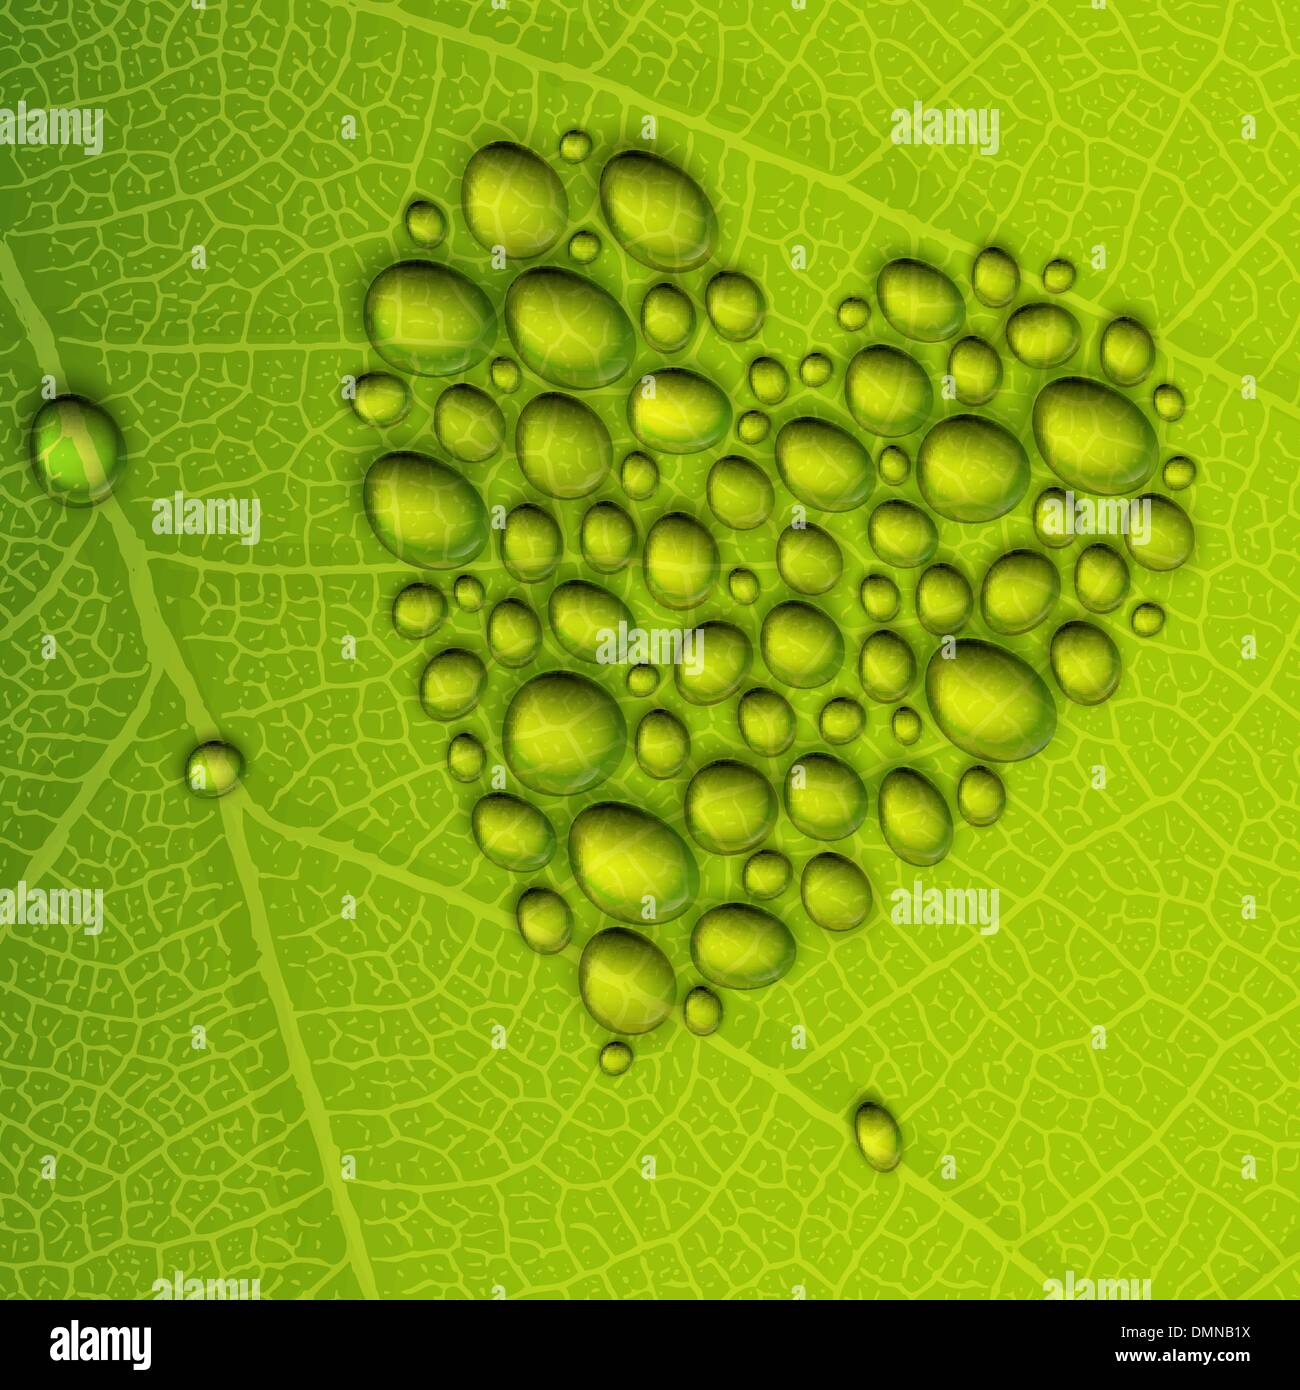 Herz Tautropfen Form auf grünes Blatt. Vektor-Illustration, EPS10 Stock Vektor